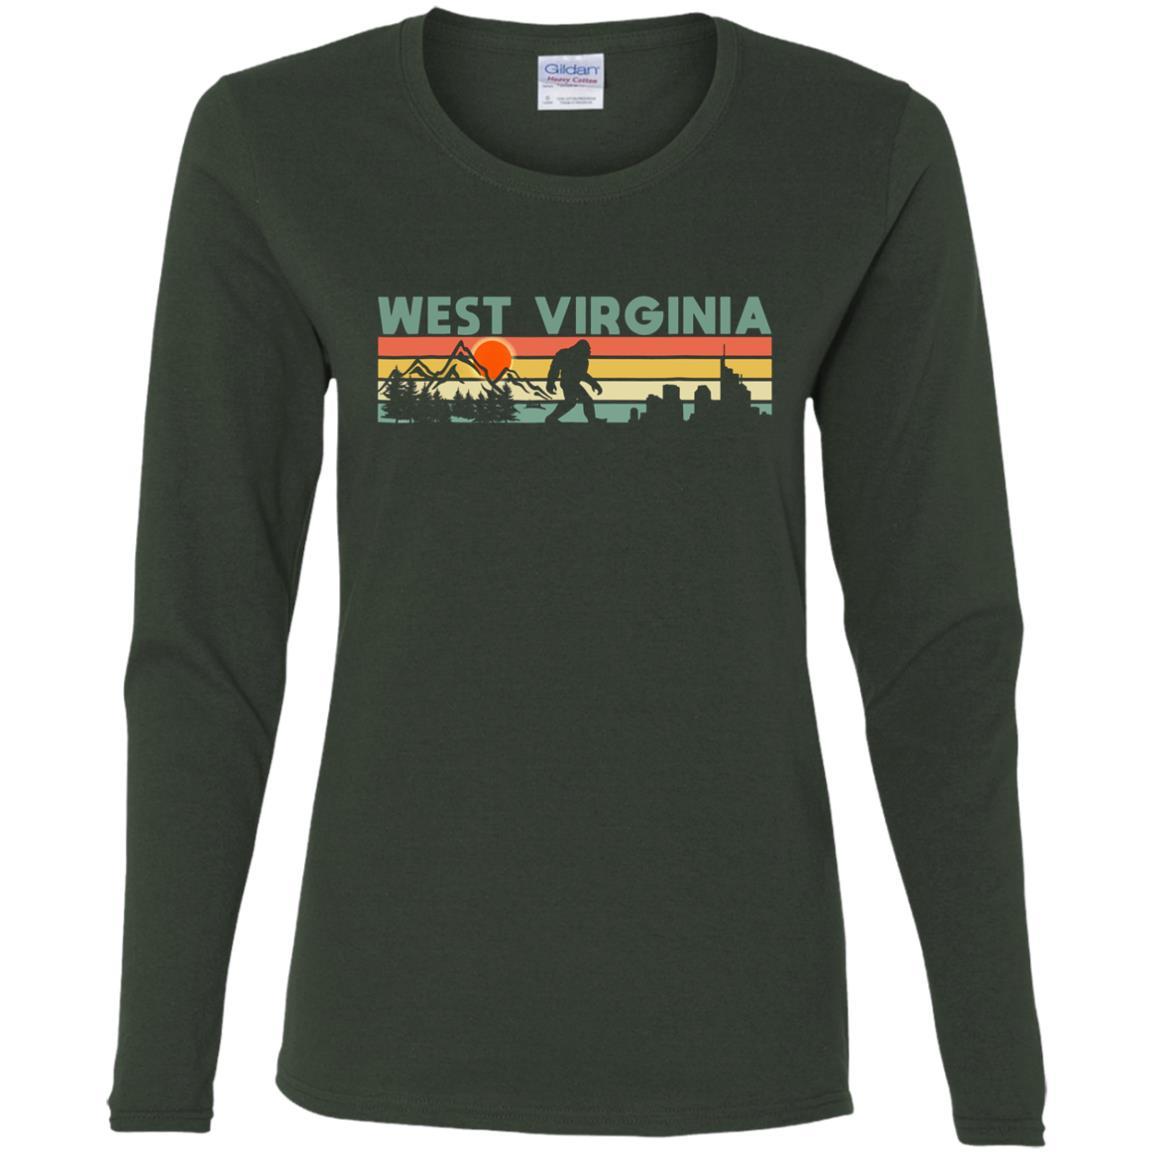 Vintage West Virginia Bigfoot Silhouette Sun Women Long Sleeve T-Shirt